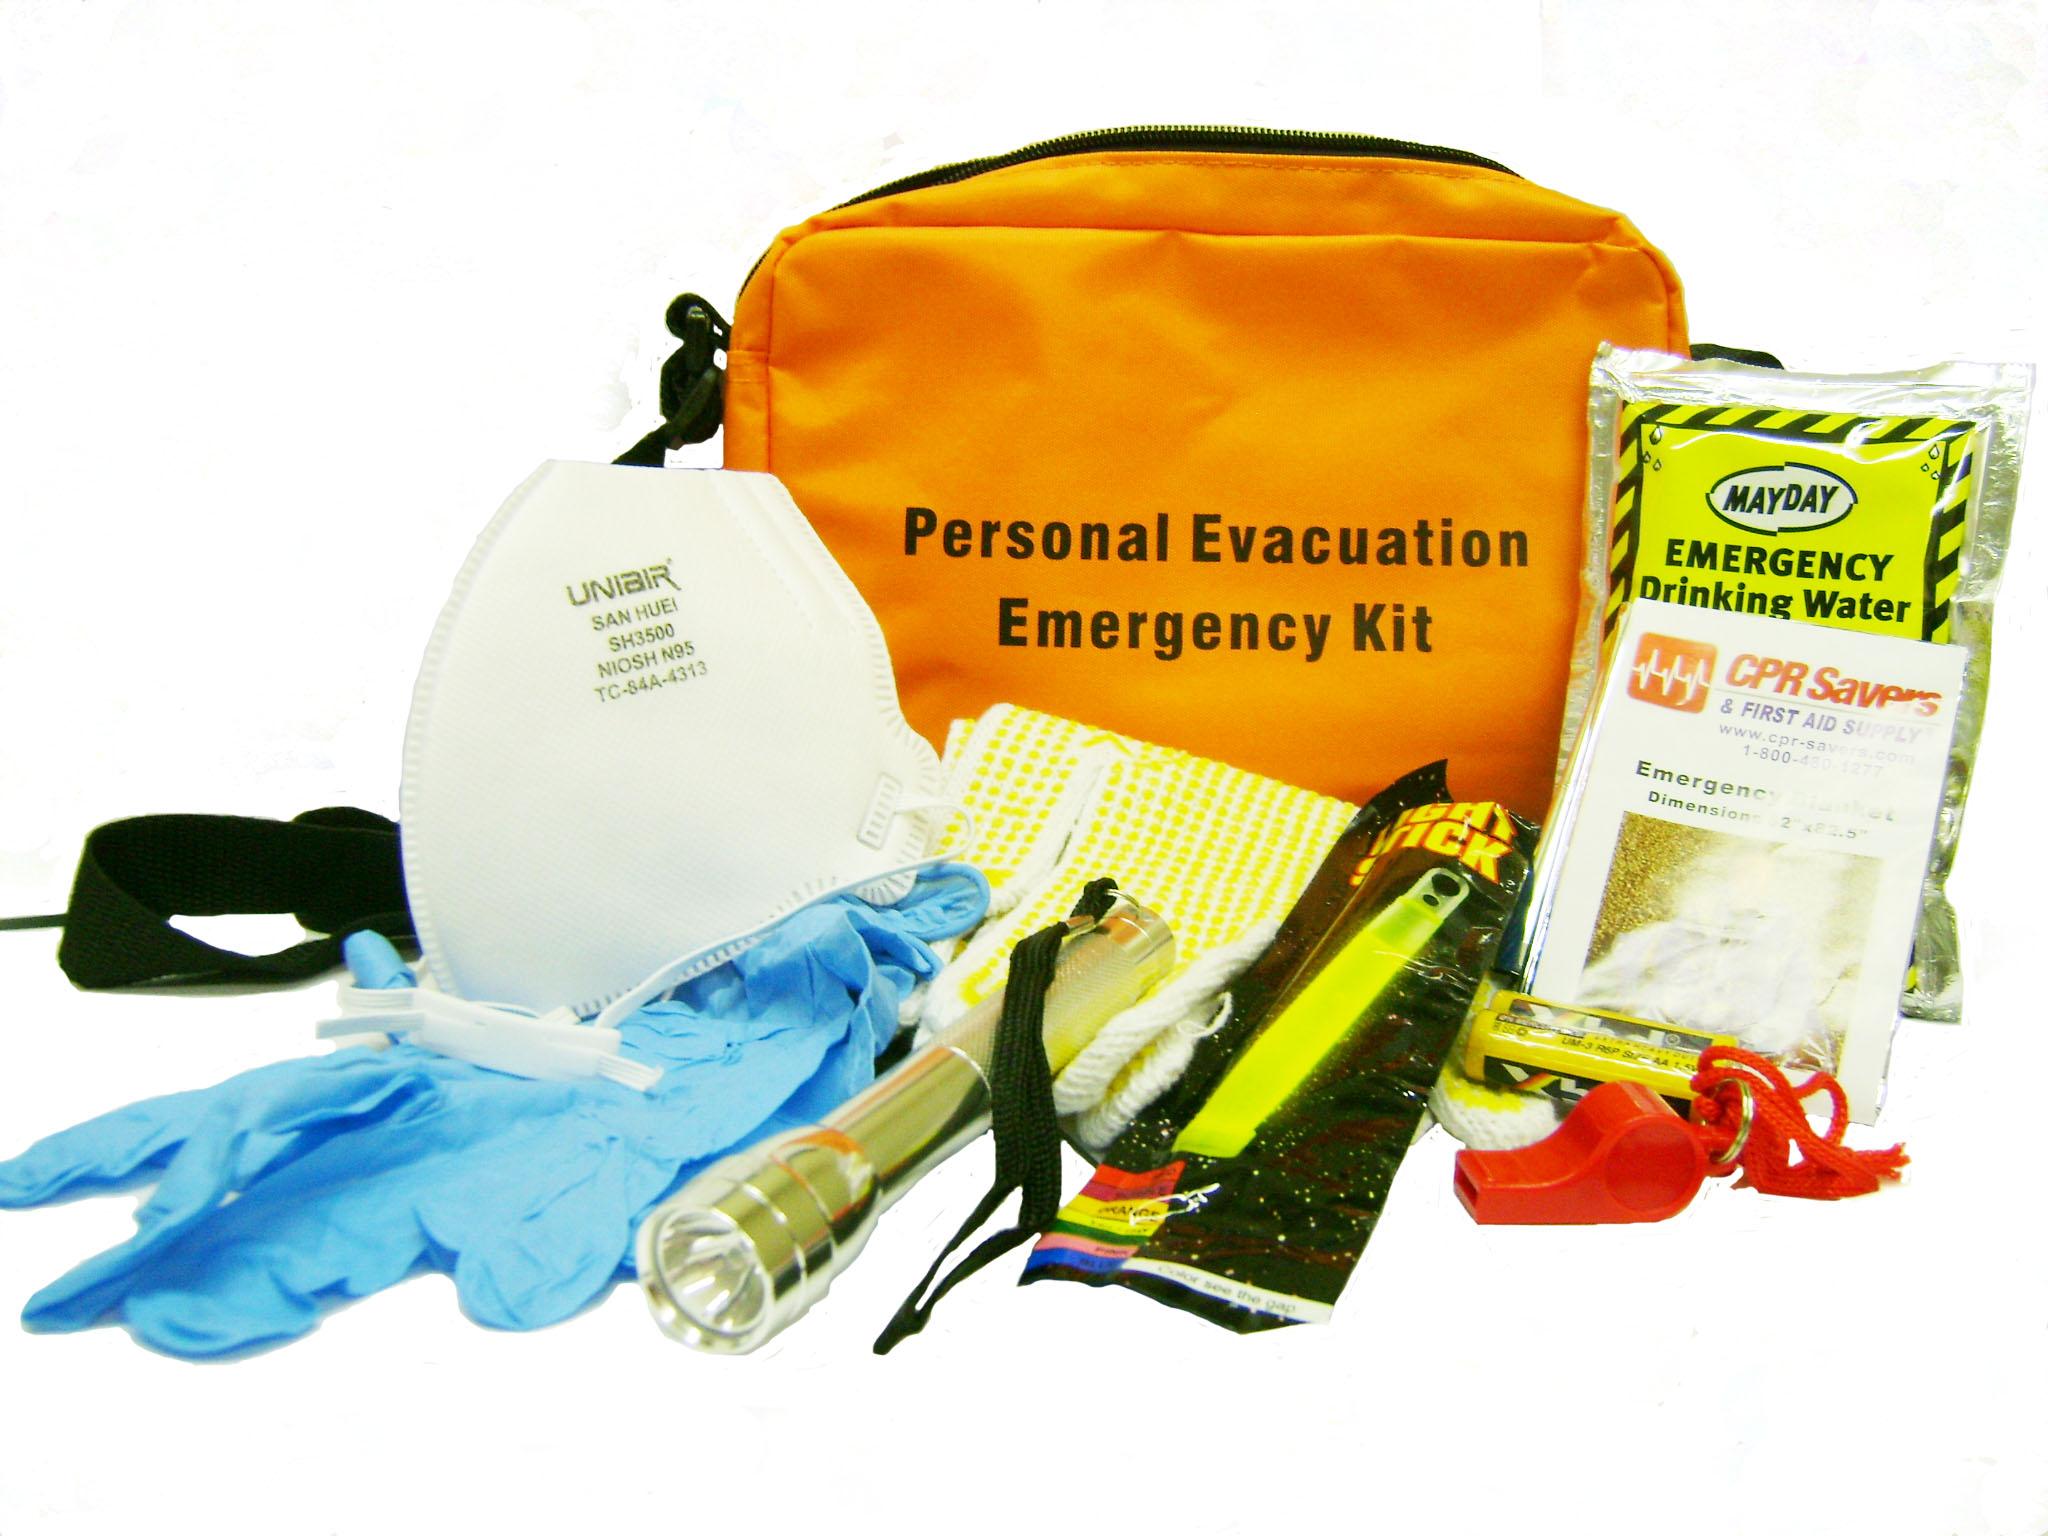 Earthquake Evacuation Kit Evacuation Emergency Kit